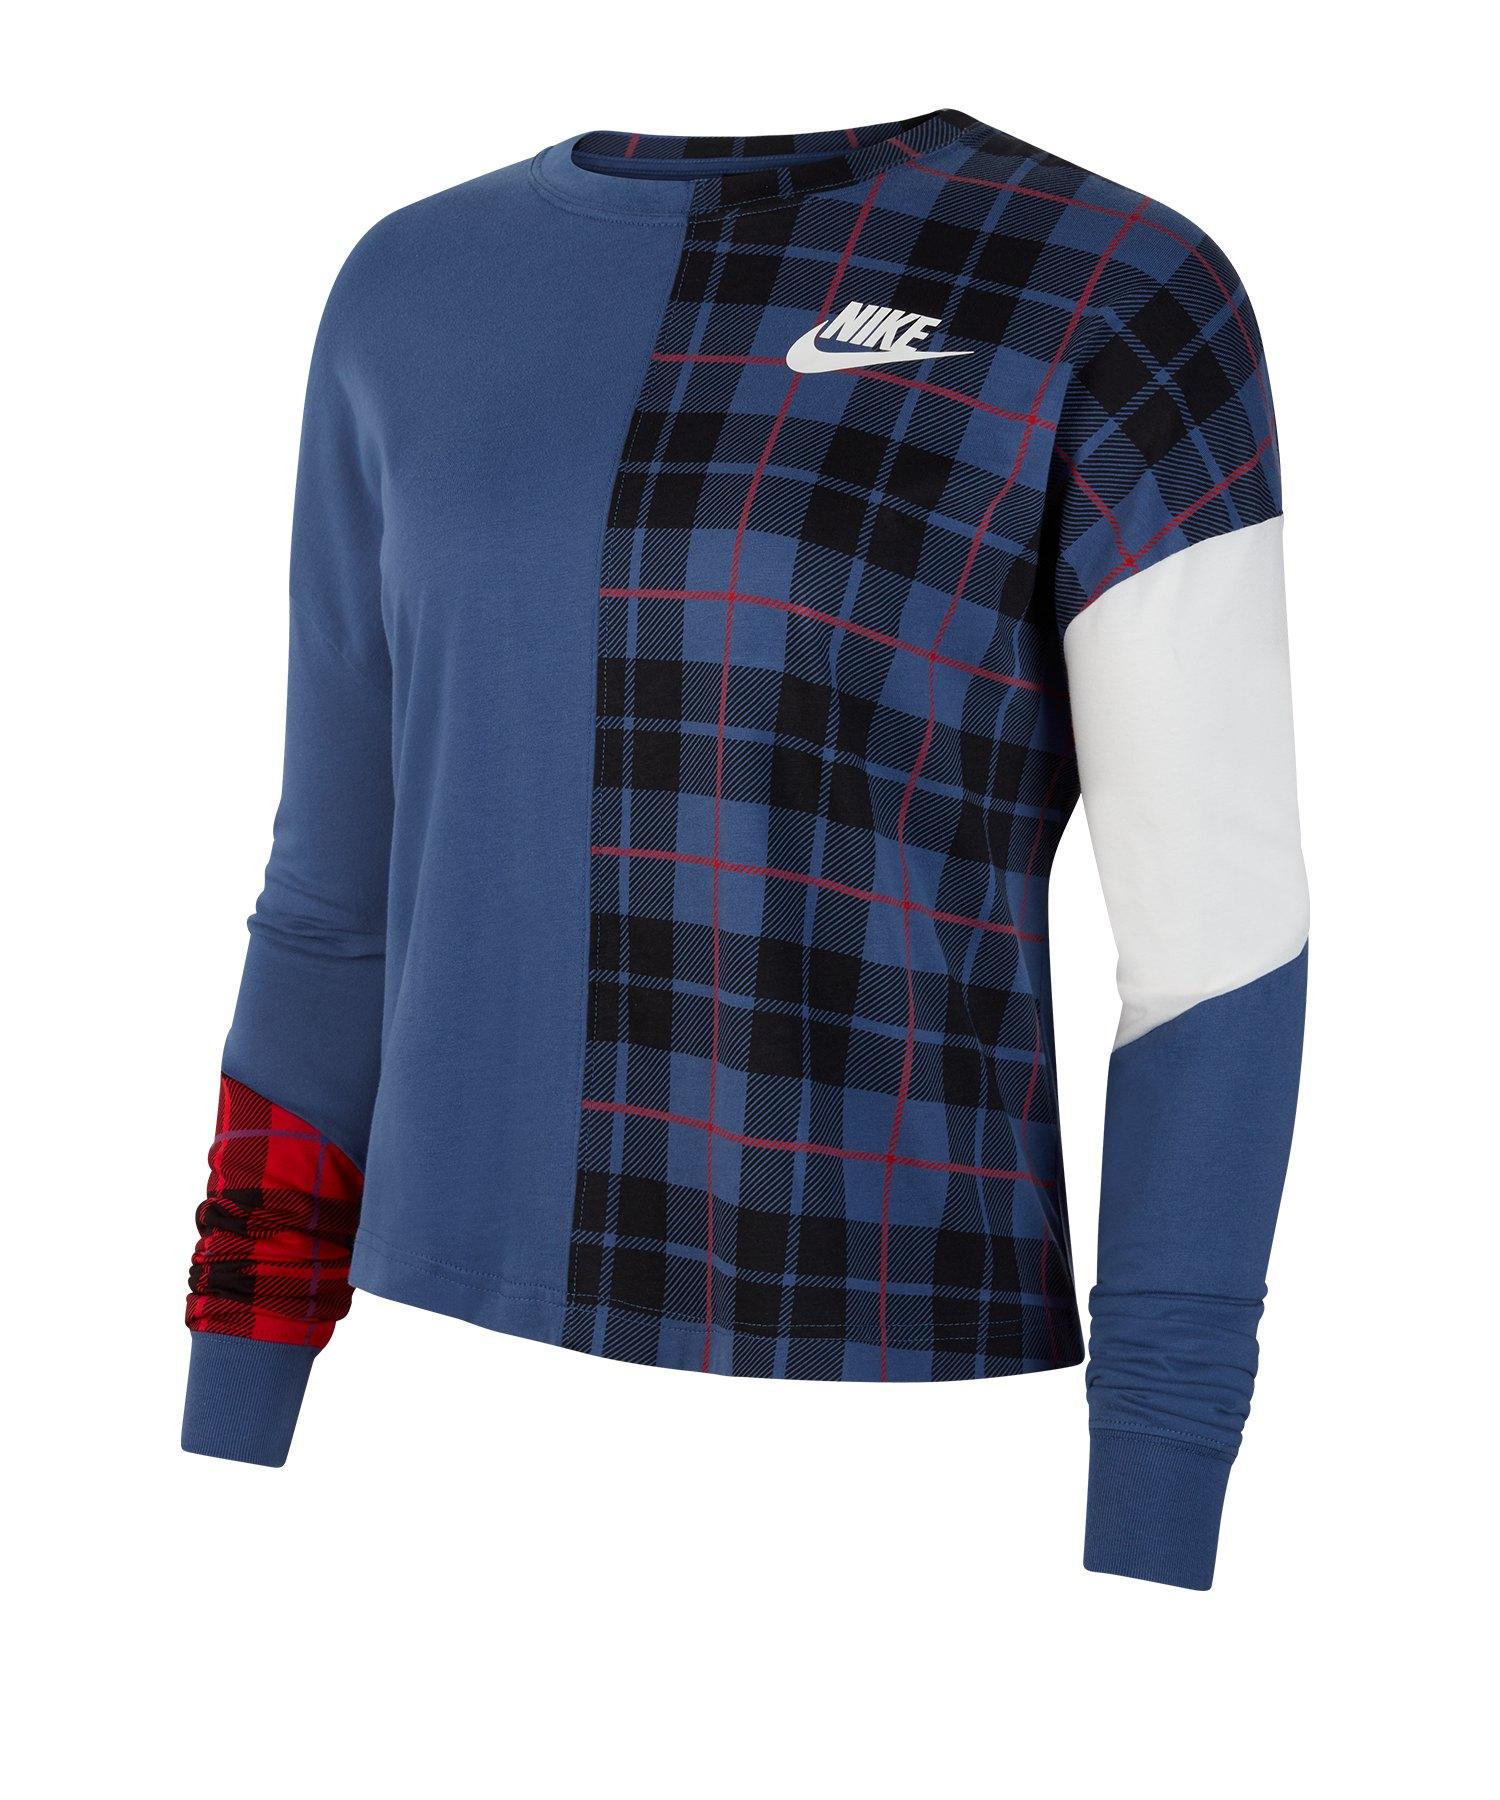 new photos c2c81 94fed Nike Longsleeve Sweatshirt langarm Damen F469